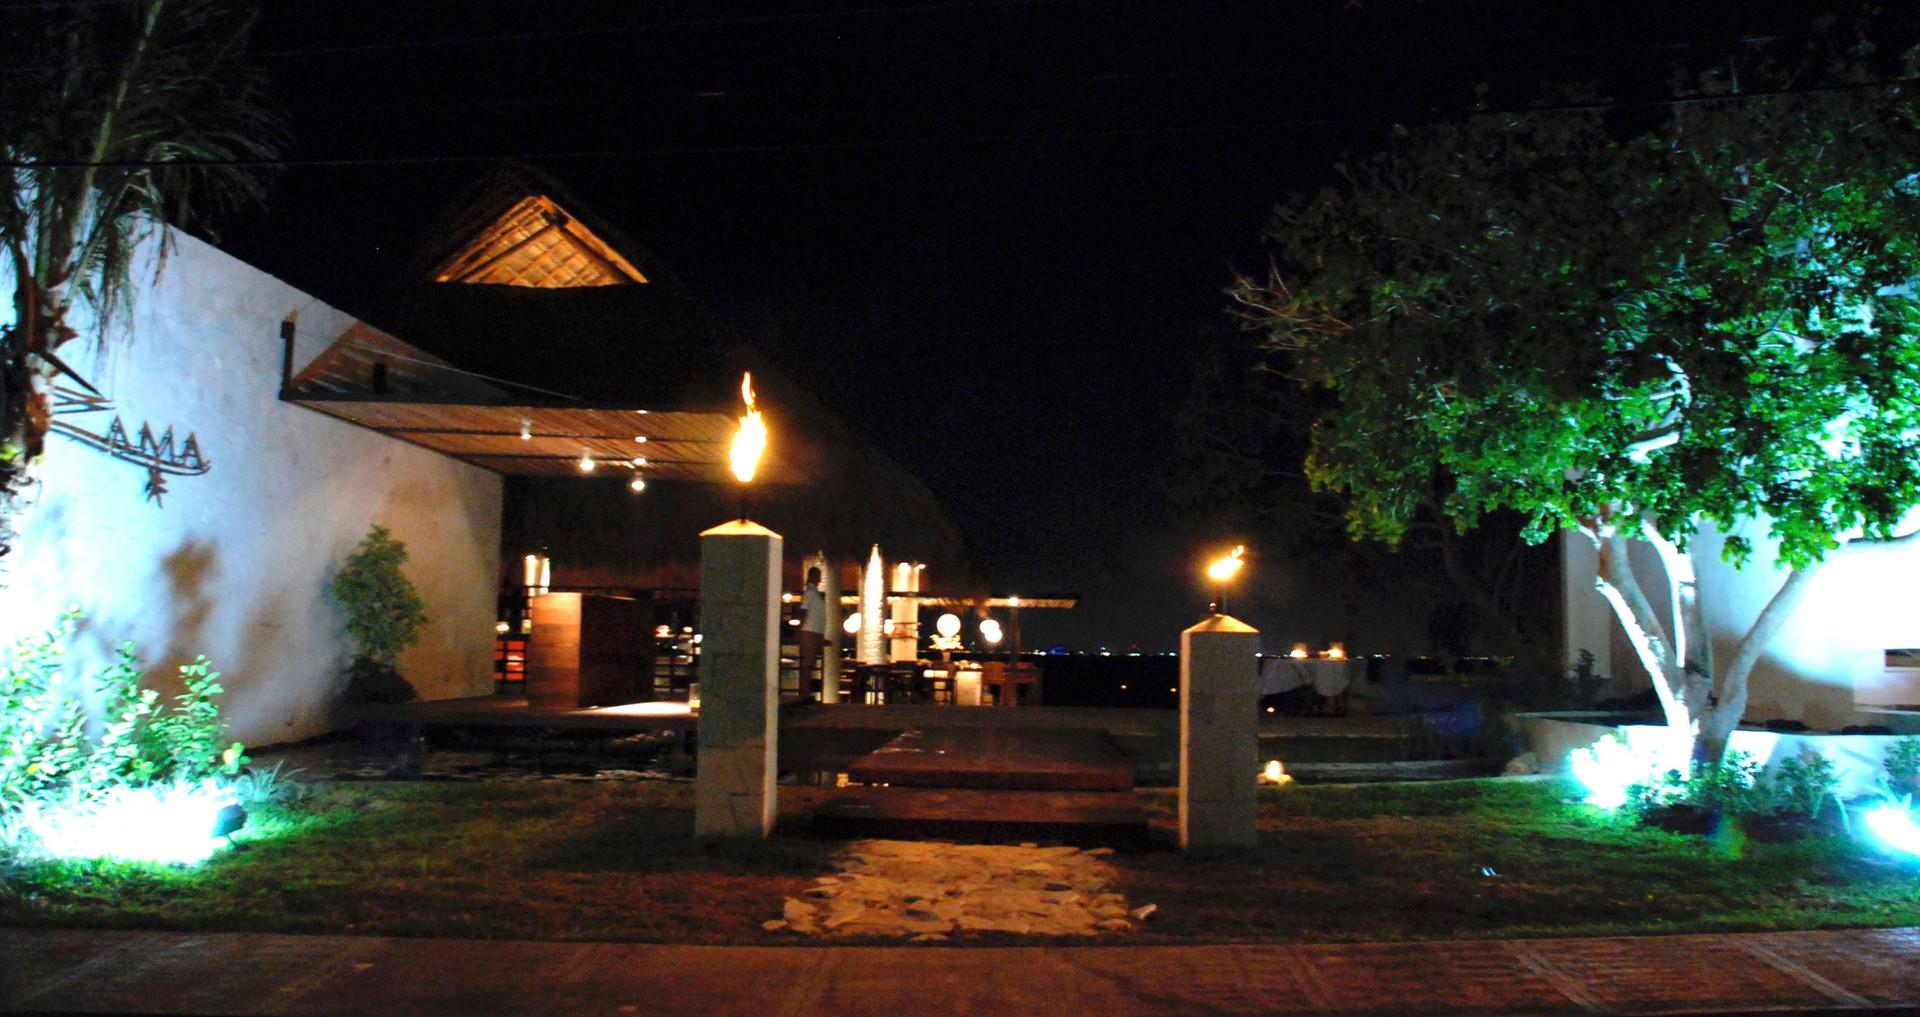 Club de playa Zama